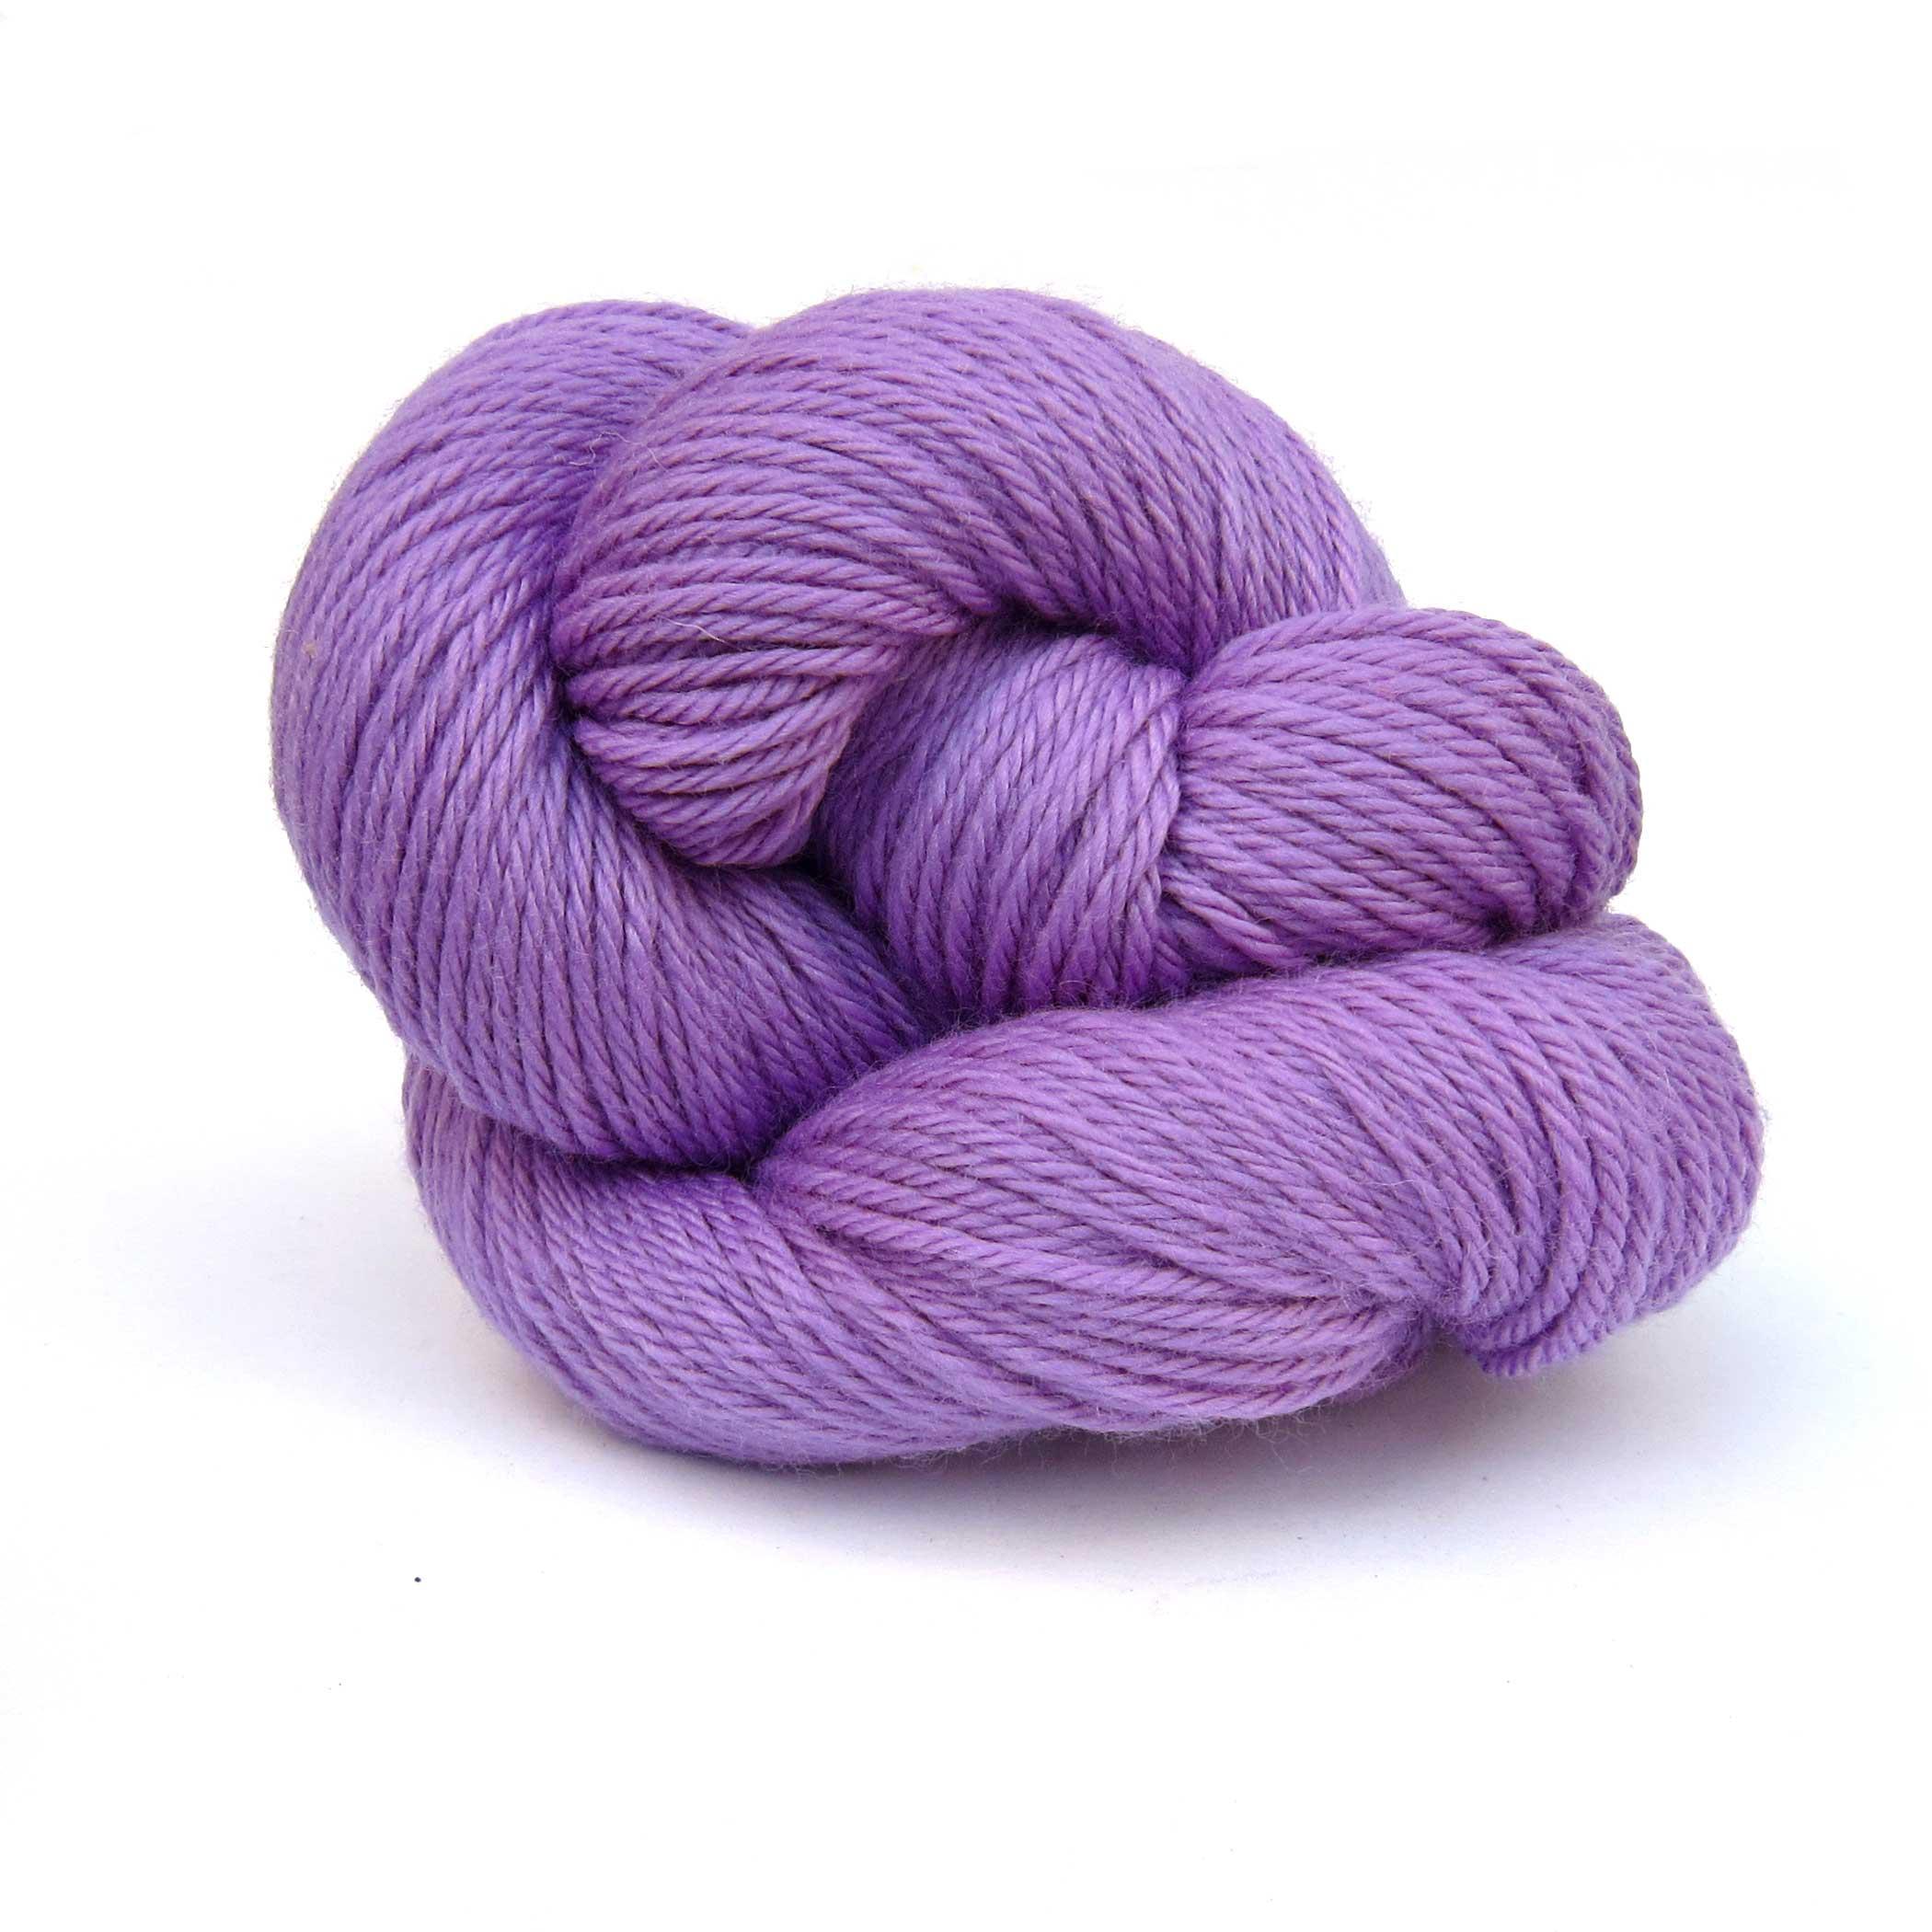 Lavender Louet Gems 100% Merino Superwash Yarn